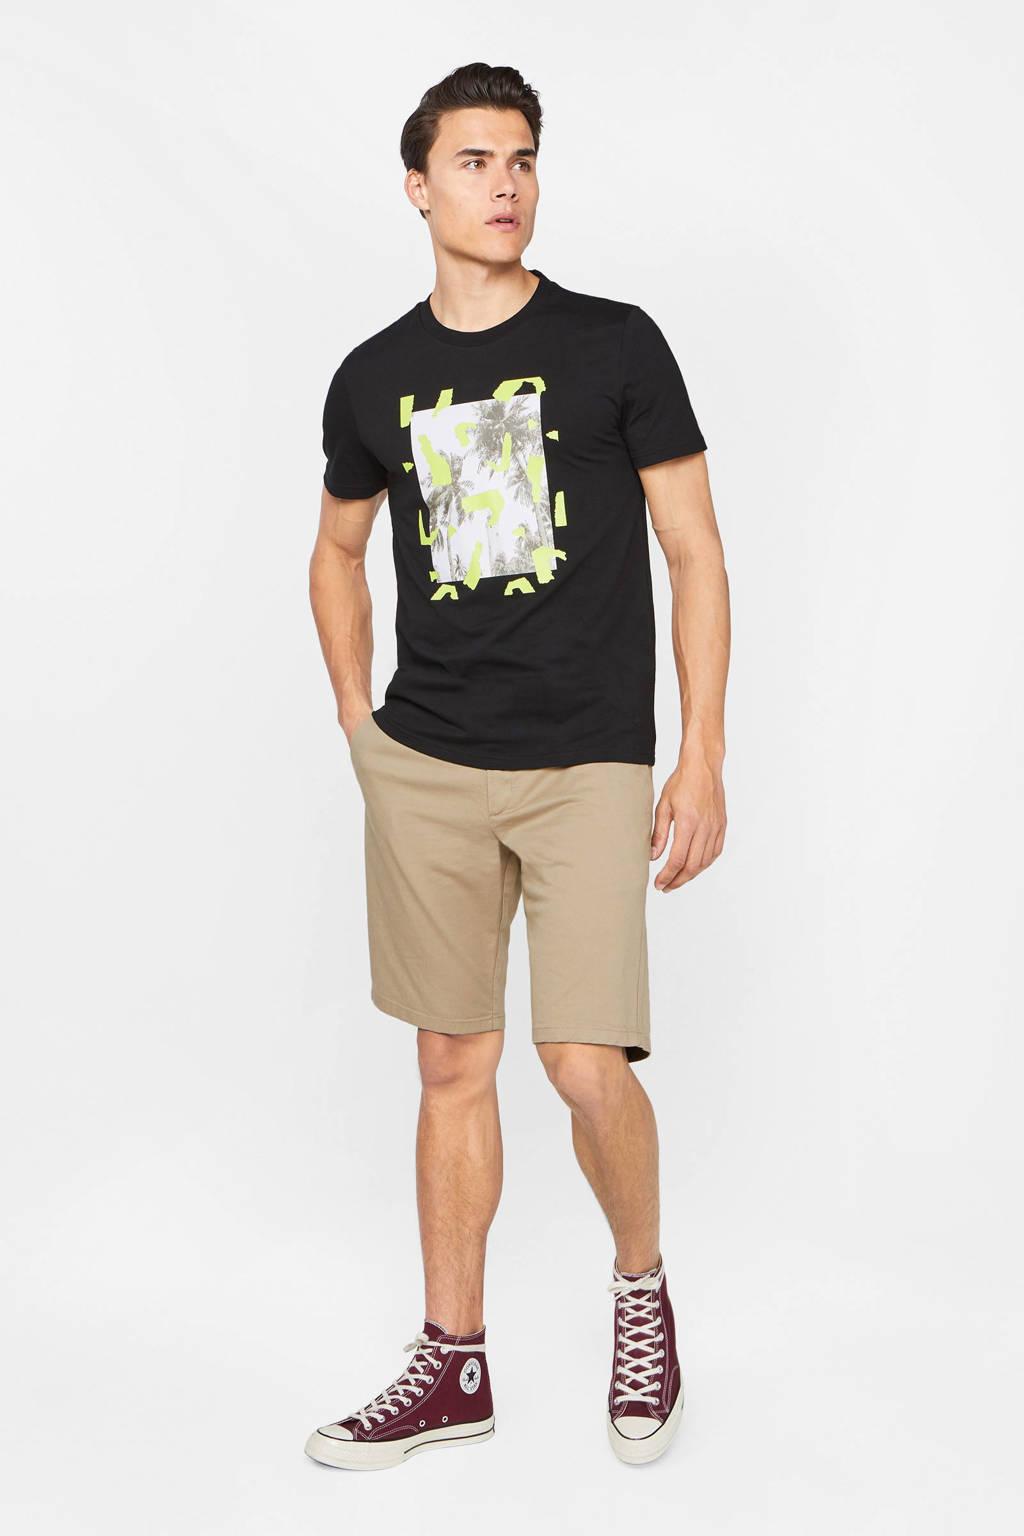 WE Fashion T-shirt met printopdruk zwart/wit/geel, Zwart/wit/geel